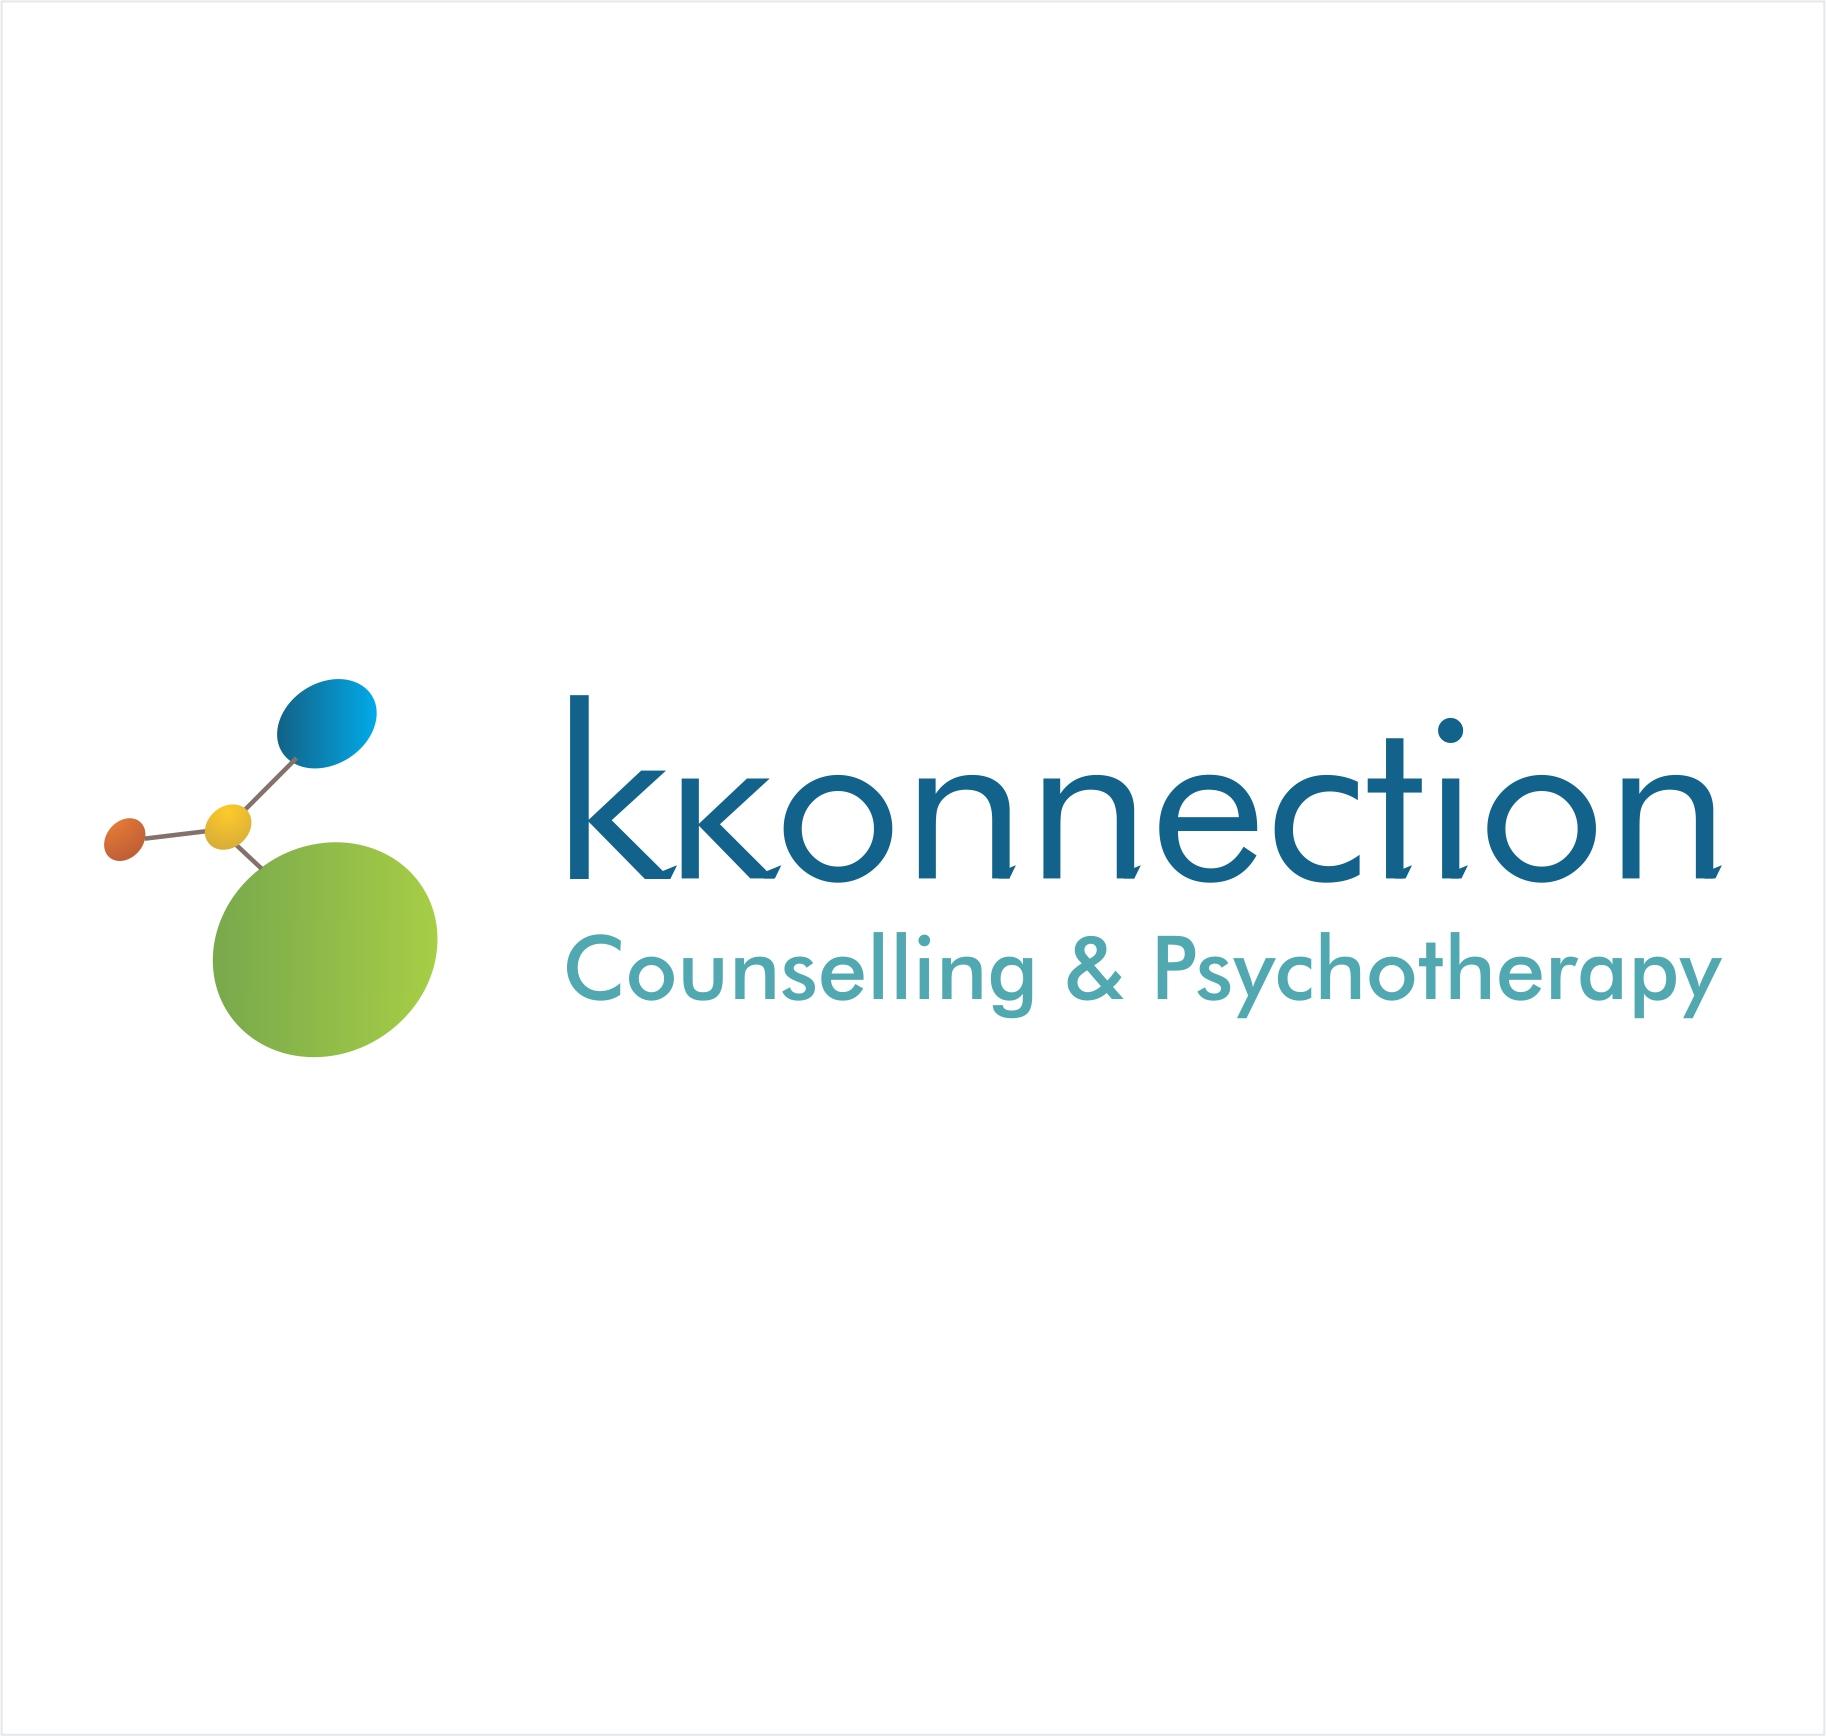 Kkonnection Logo